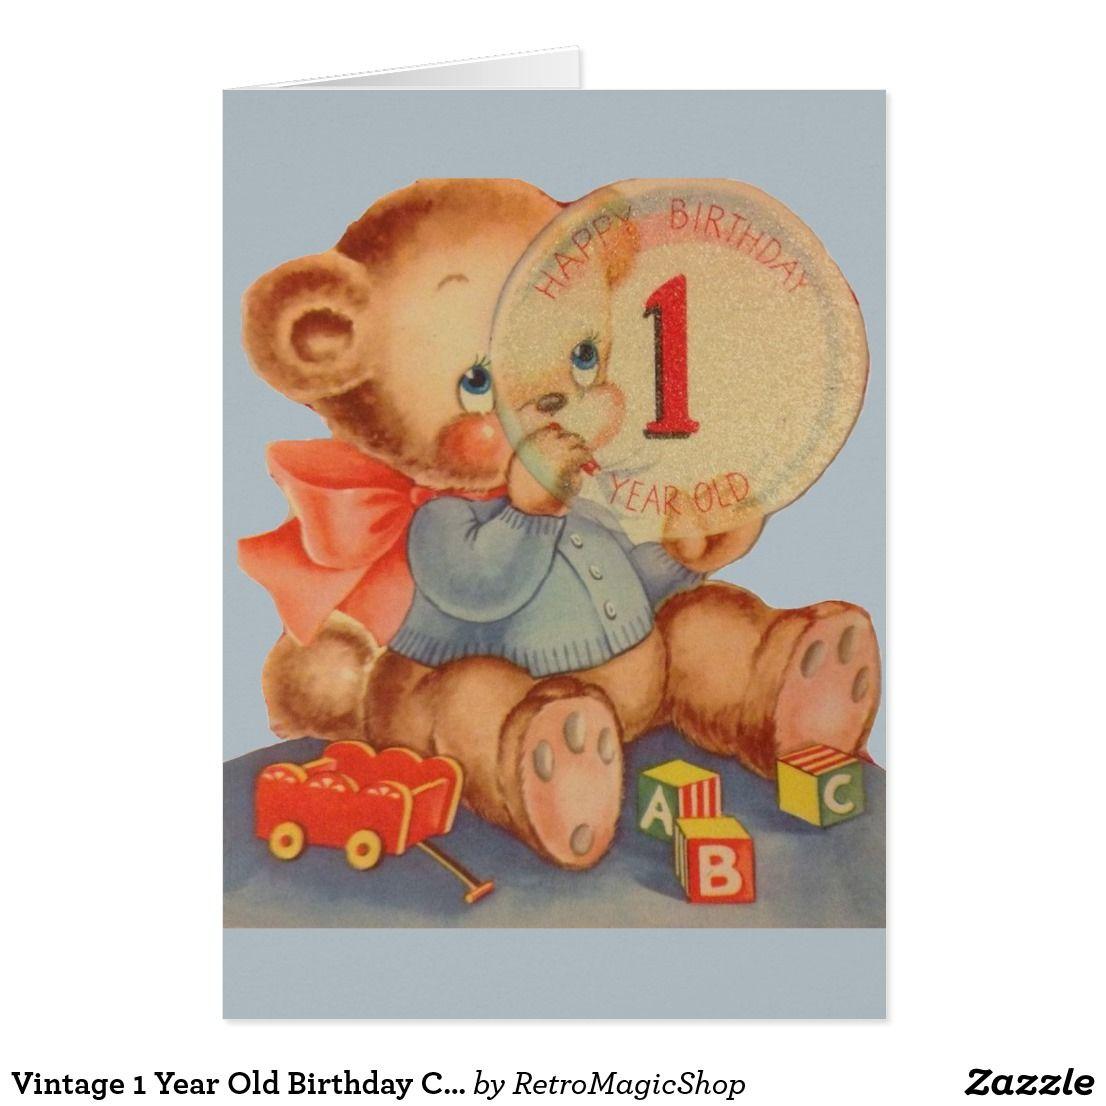 Vintage 1 year old birthday card vintage birthday cards vintage 1 year old birthday card kristyandbryce Choice Image